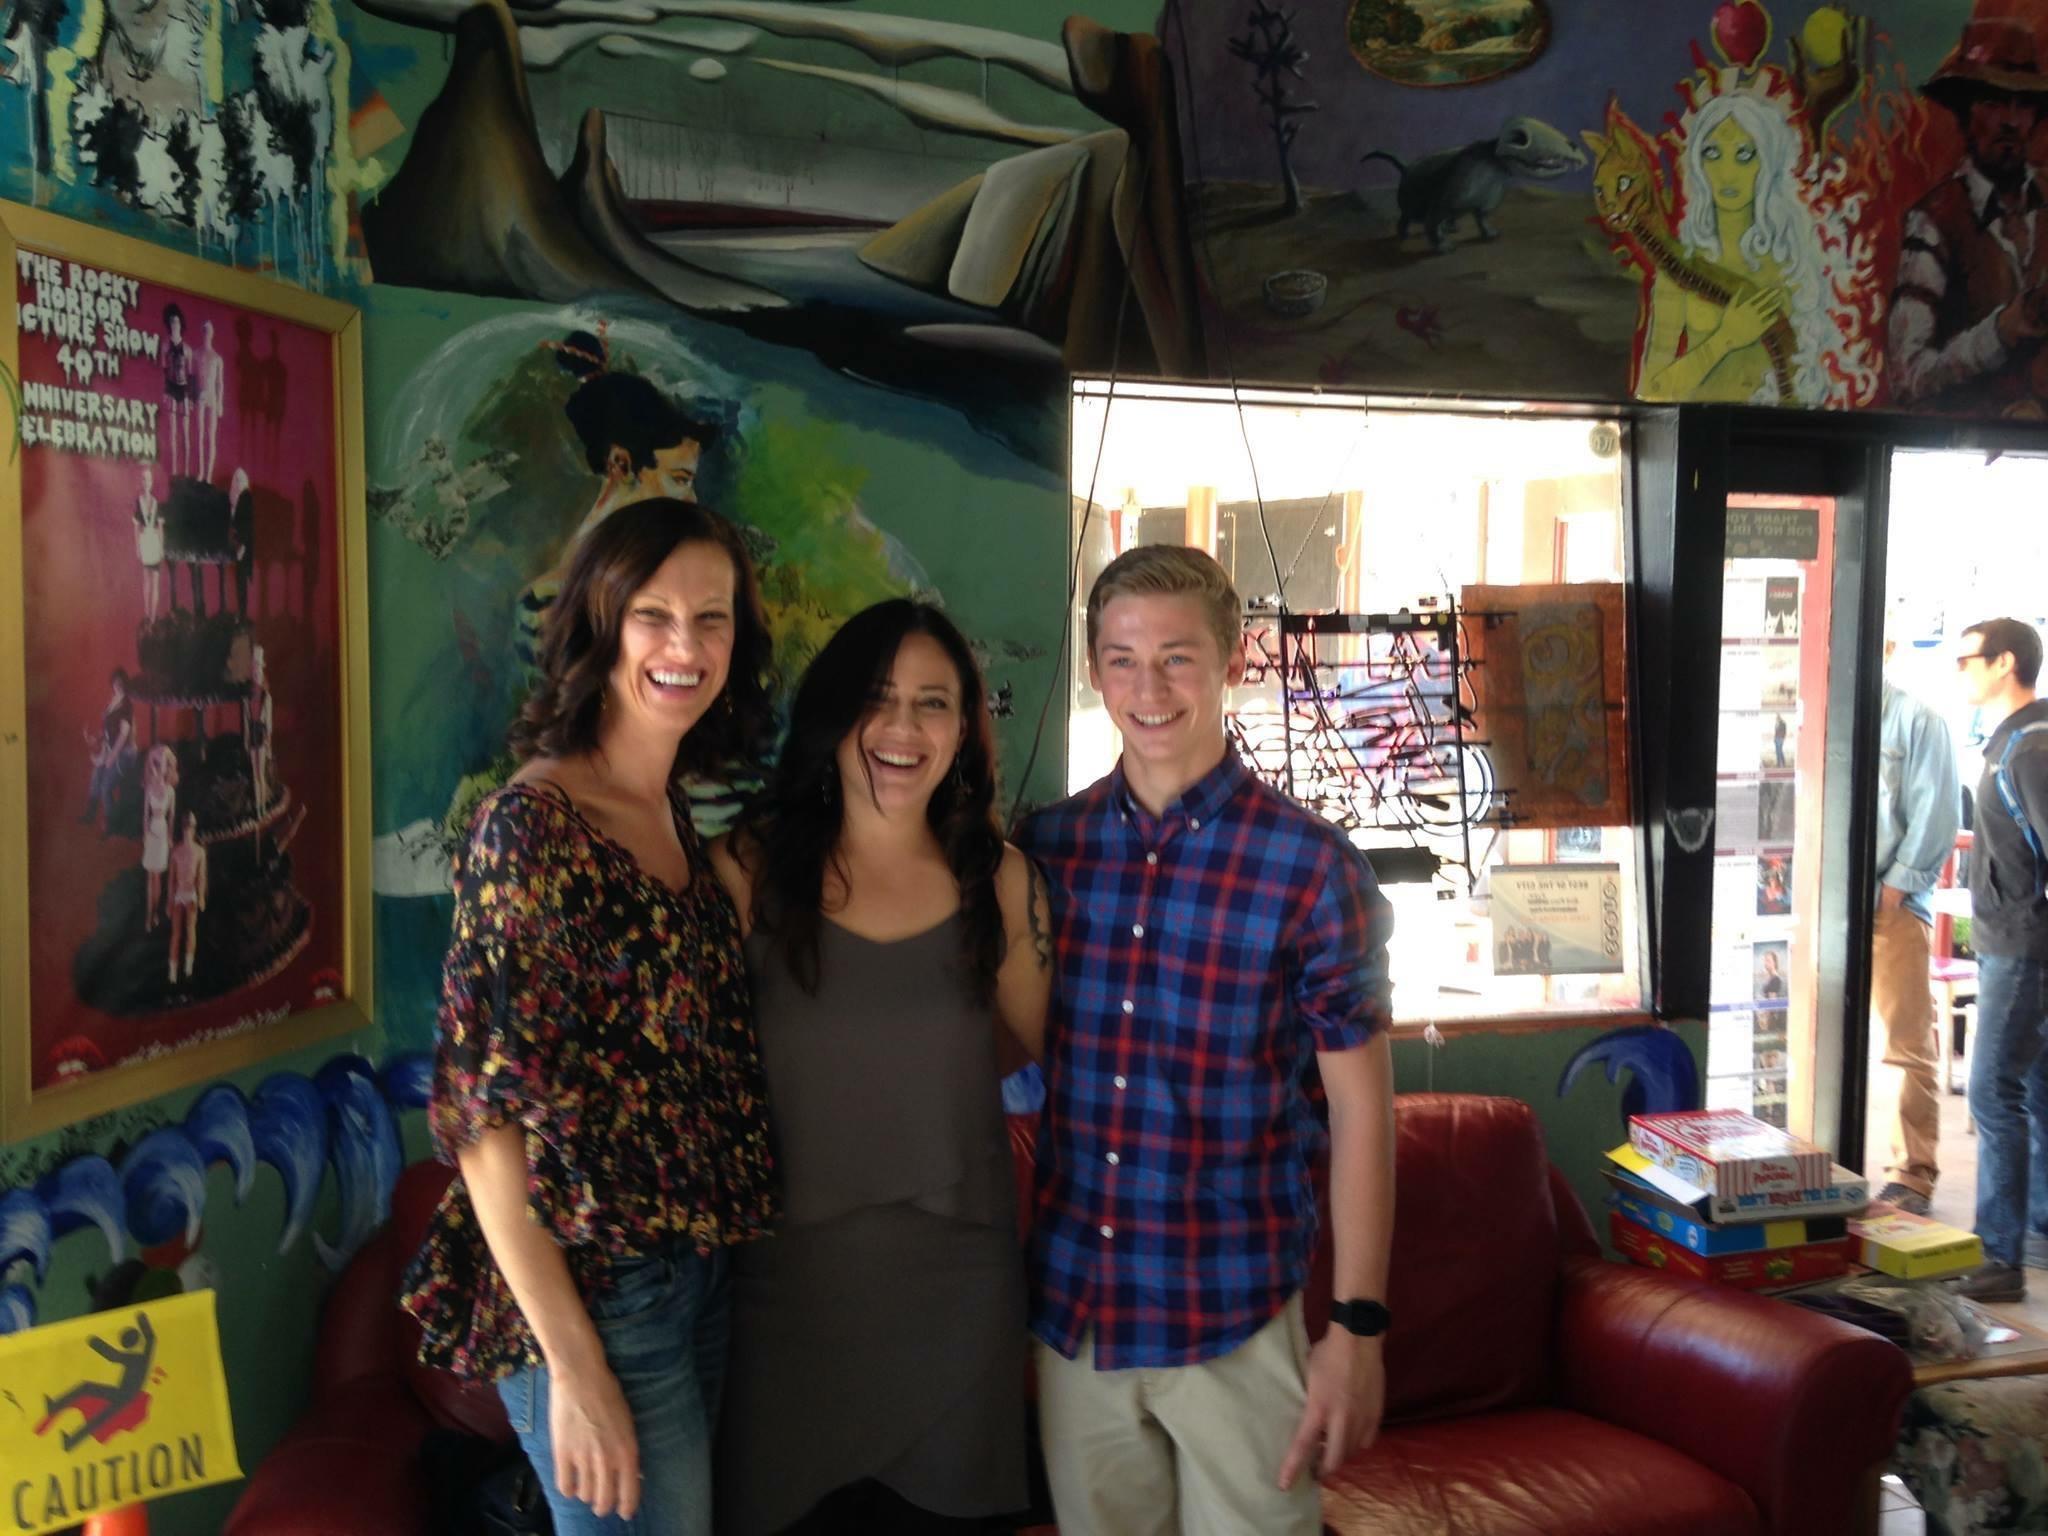 From the left - Lea Marlene, Elena Rose Davis,Conner Greenhalgh:image courtesy Elena Rose Davis Facebook page